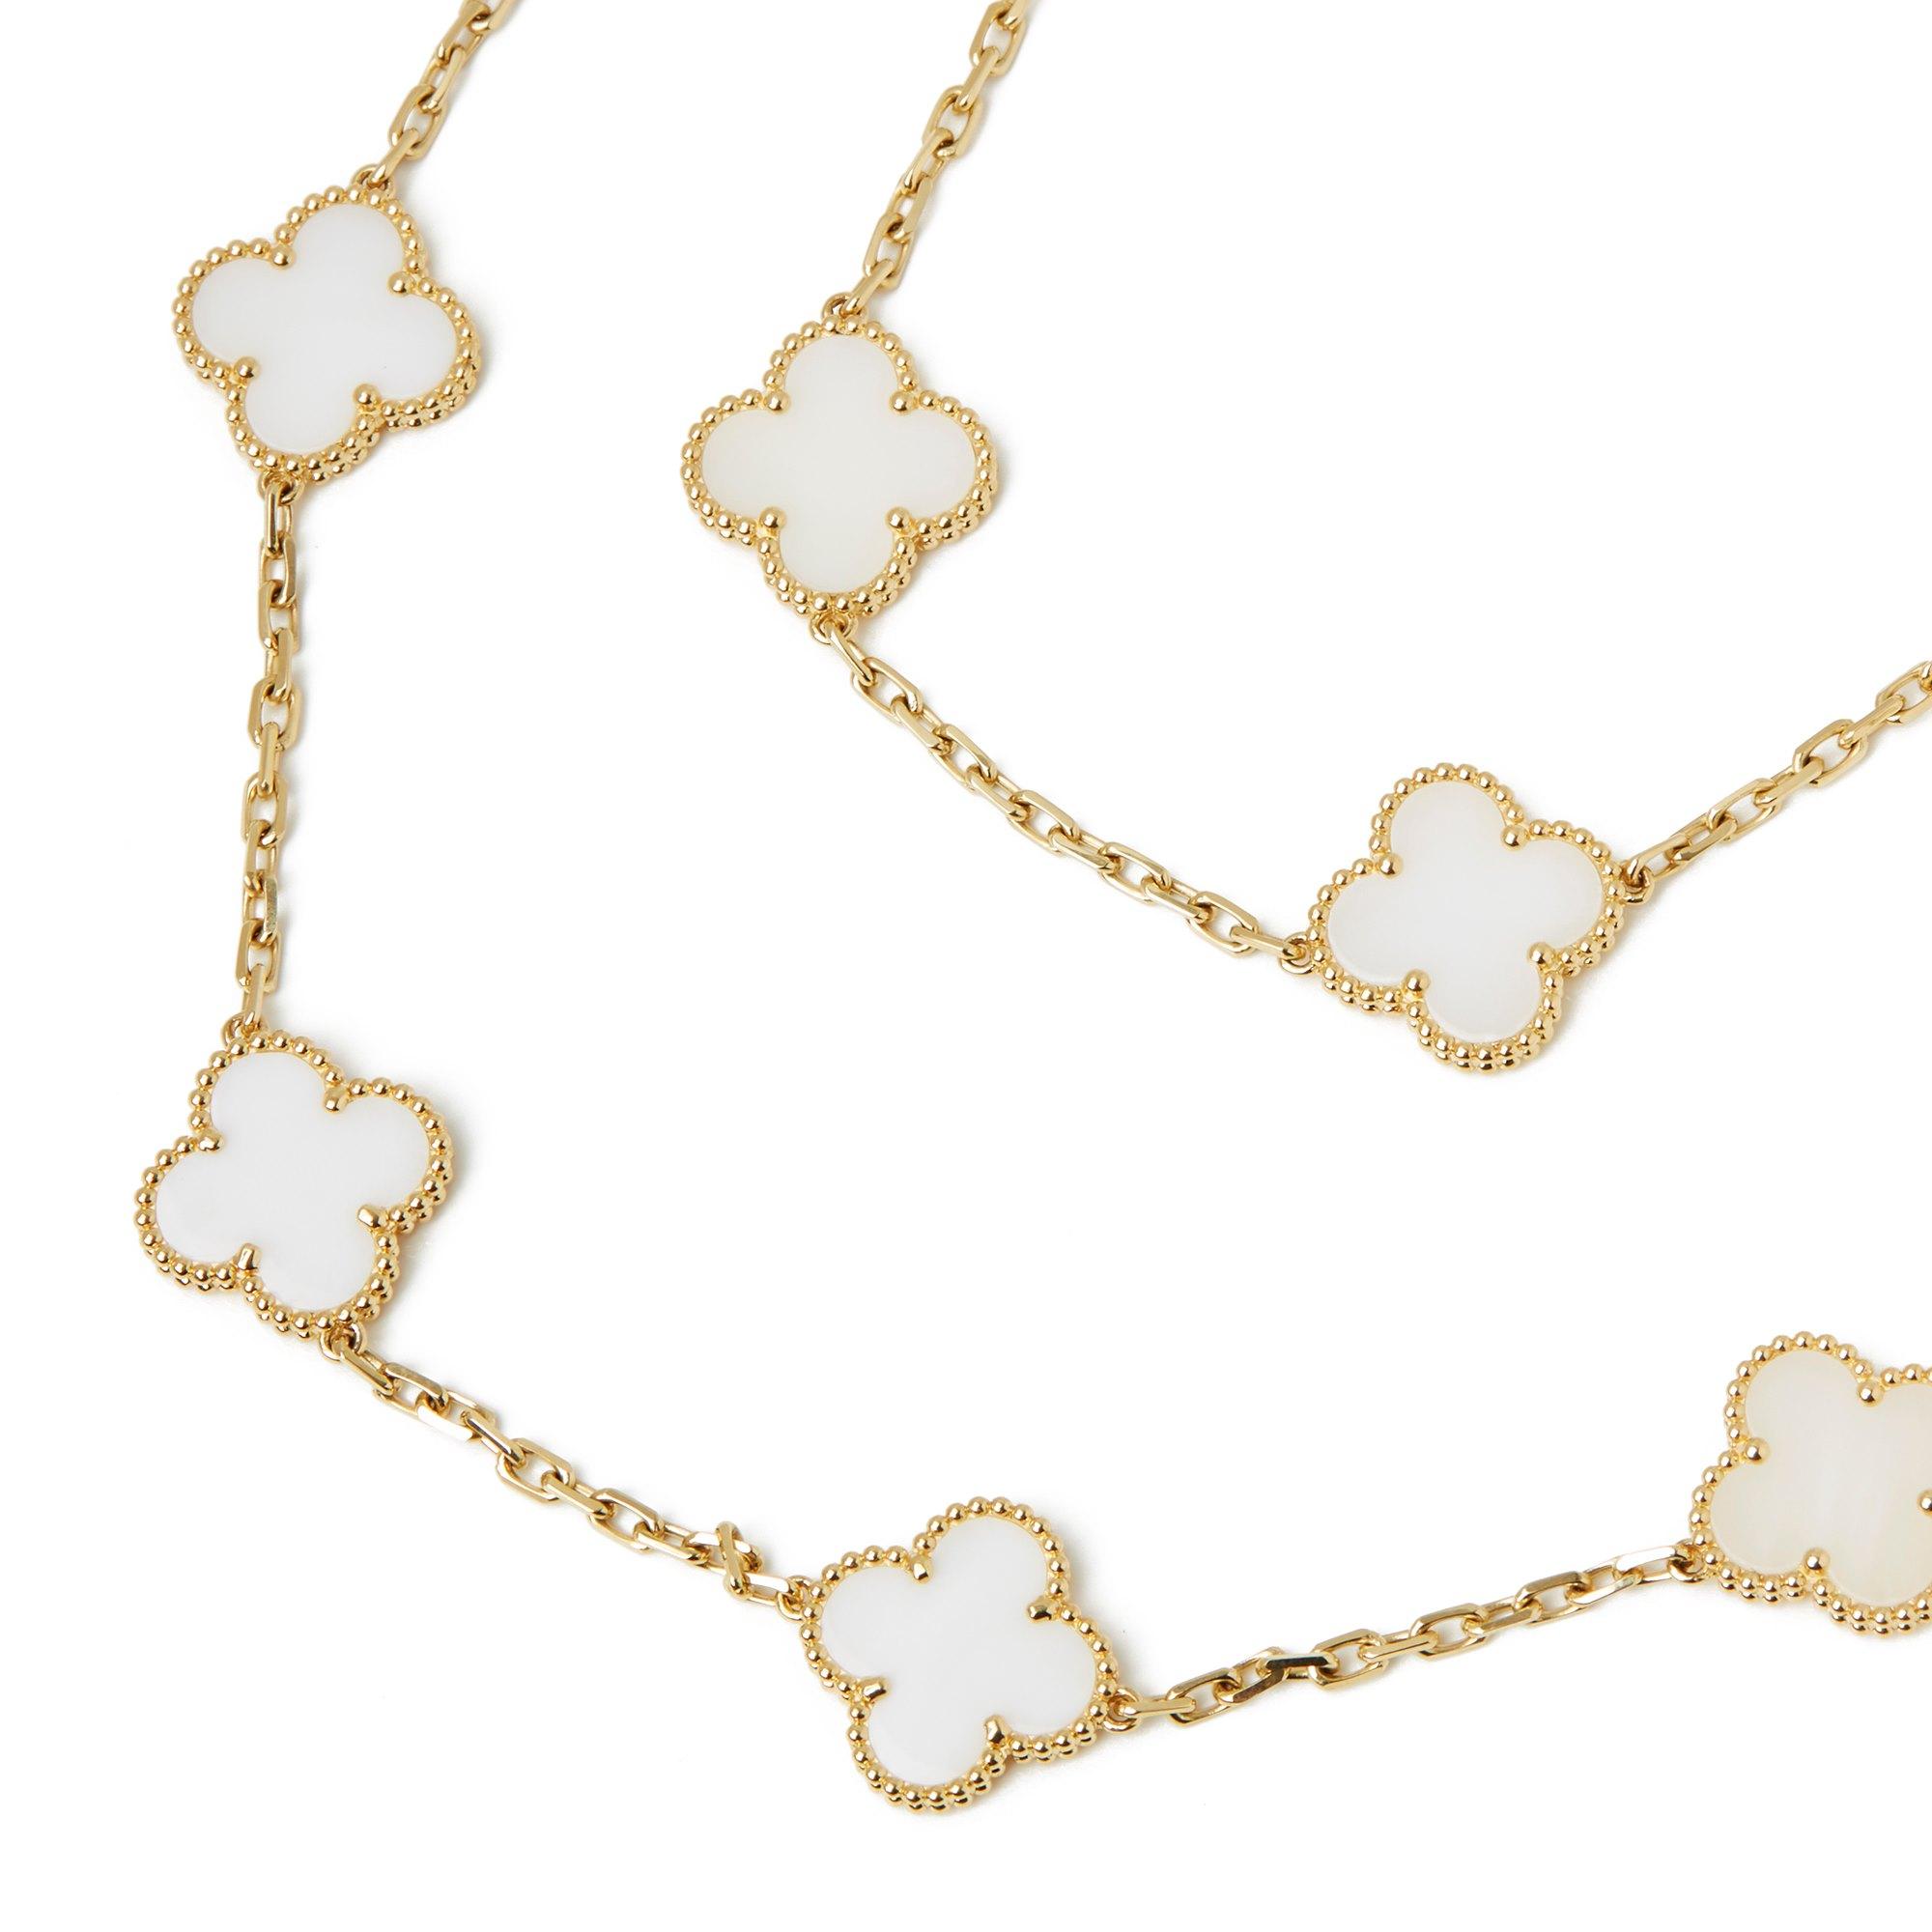 Van Cleef & Arpels 18k Yellow Gold White Coral 20 Motif Vintage Alhambra Necklace